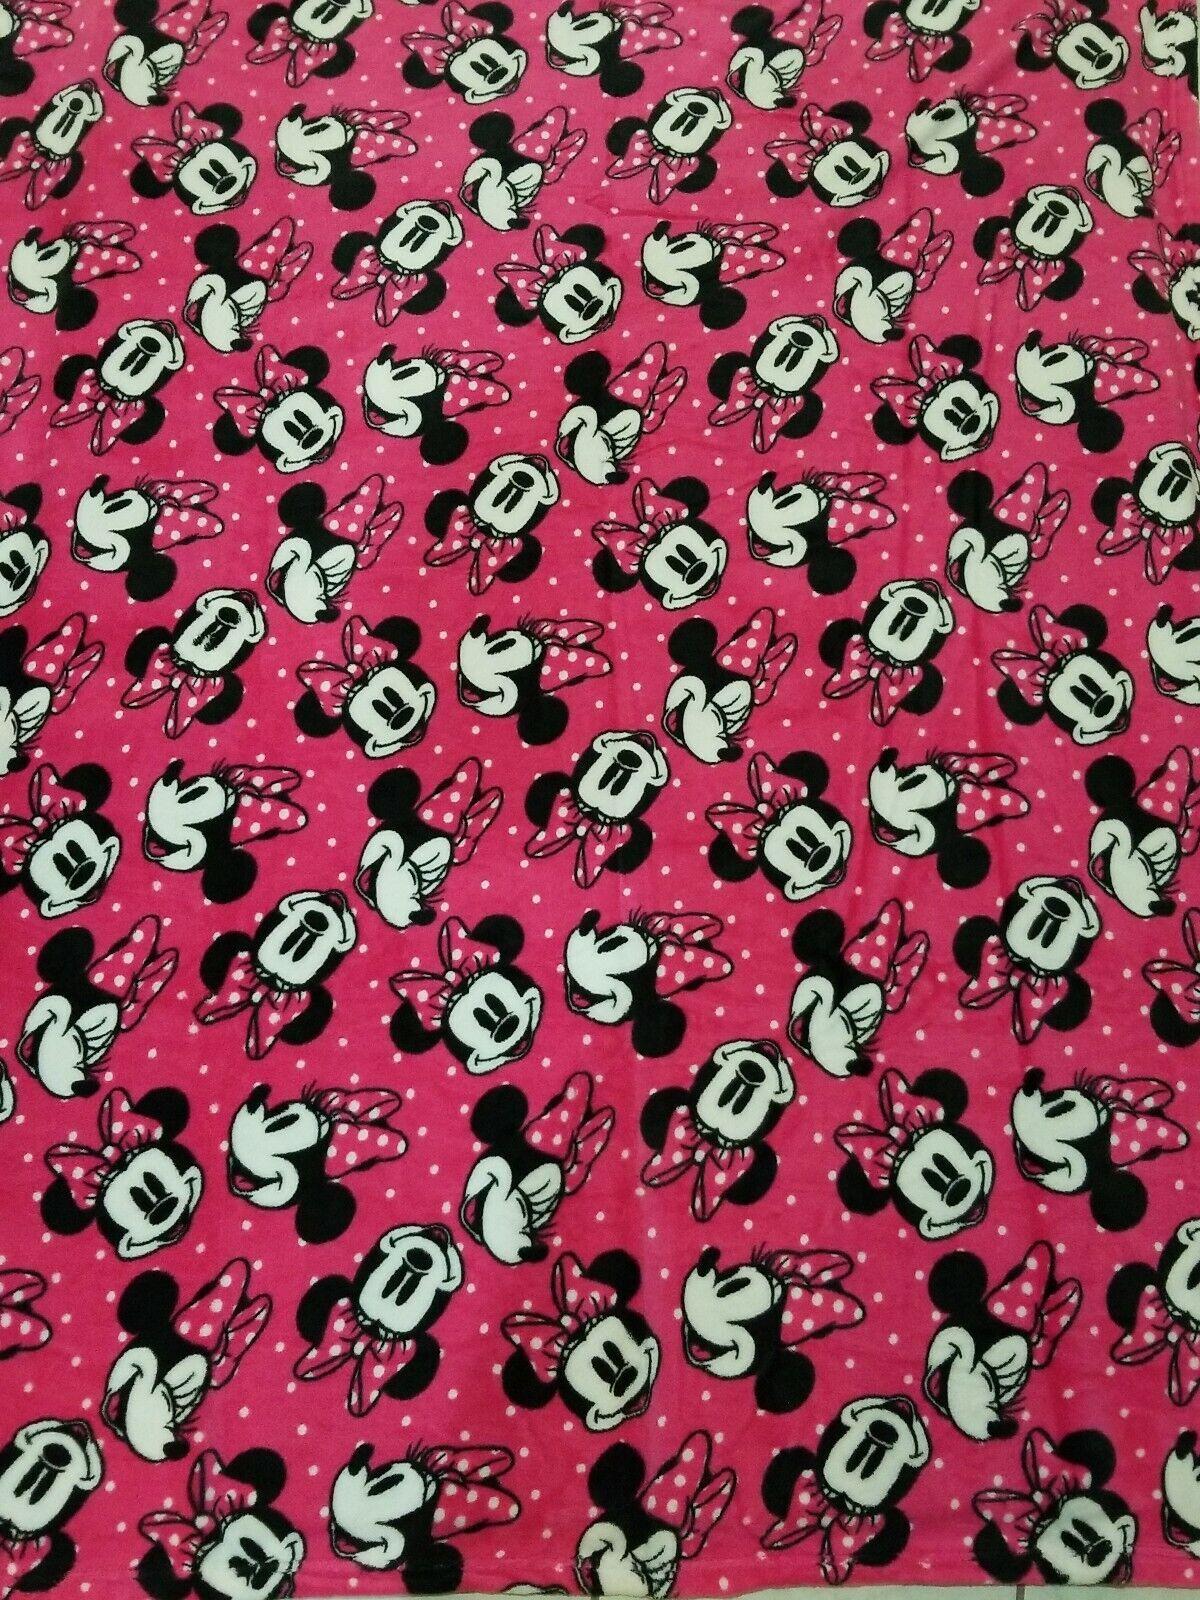 BRAND NEW Disney Minnie Mouse Fleece Throw Blanket 60 x 50